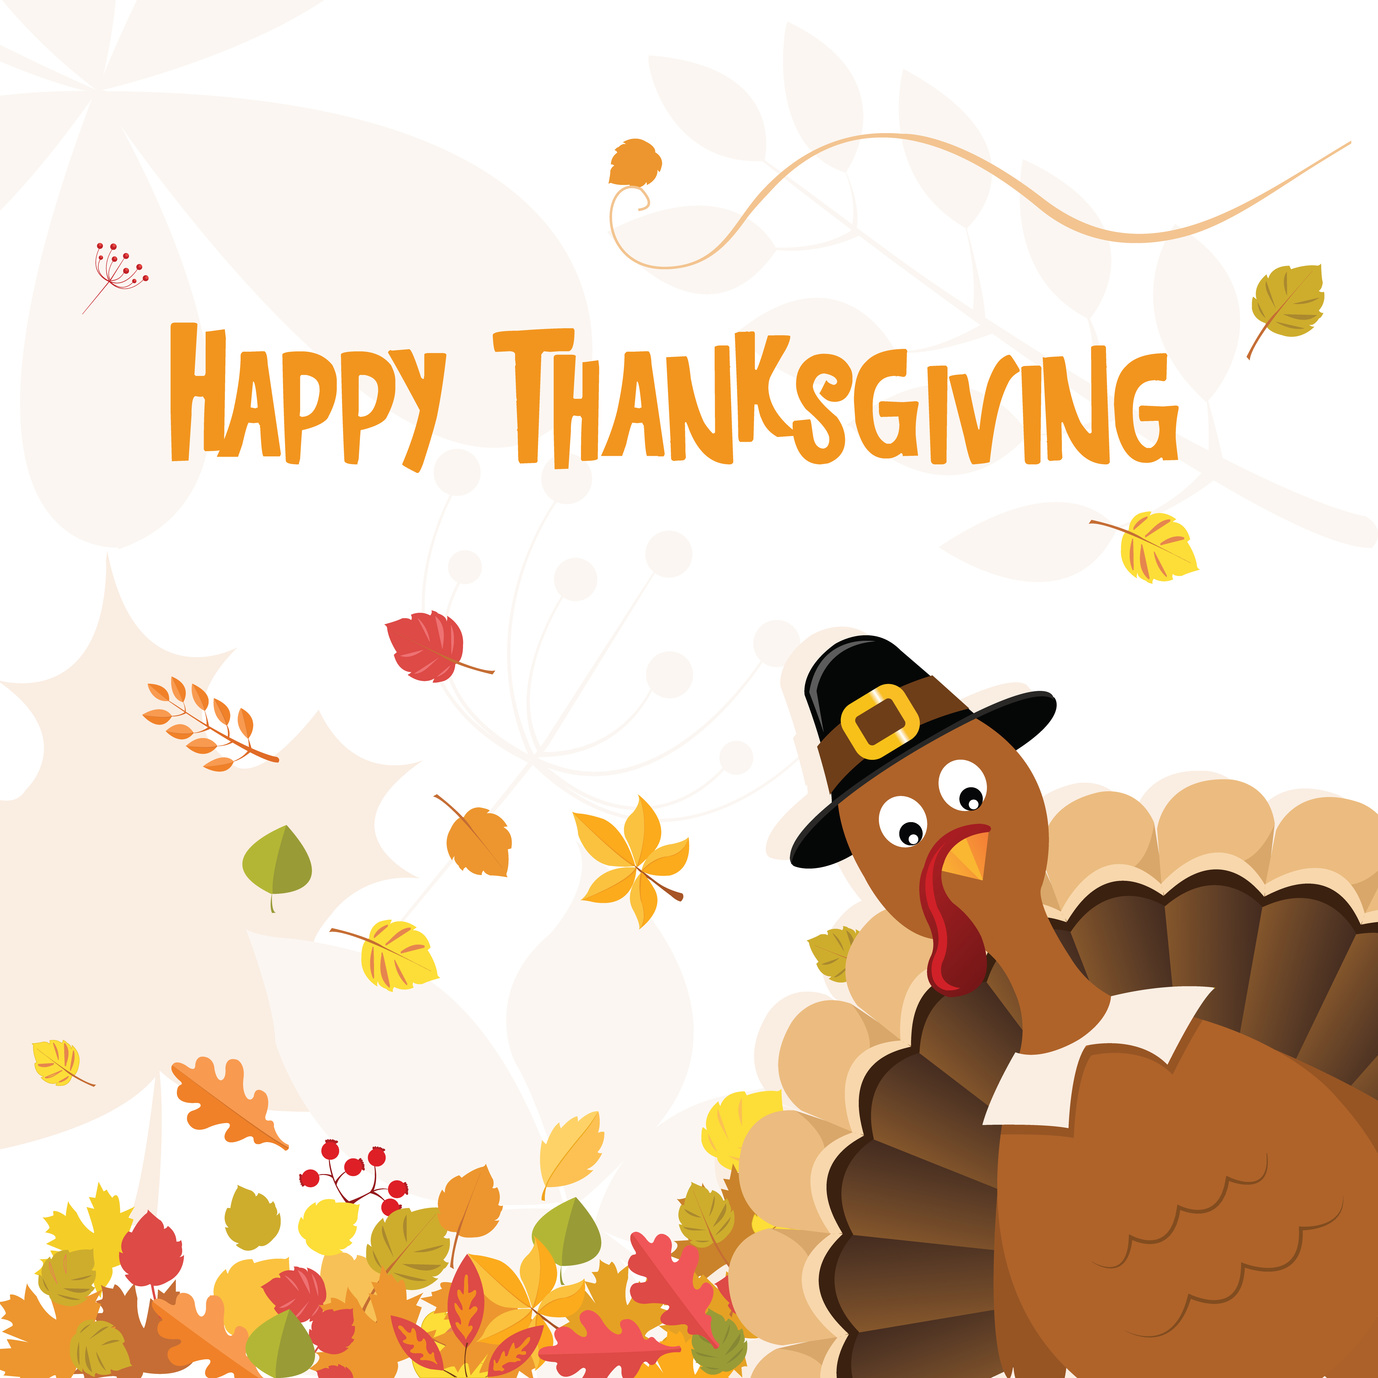 d2299c4c8 Happy Thanksgiving! – Nutrition Shoppe  Vacaville